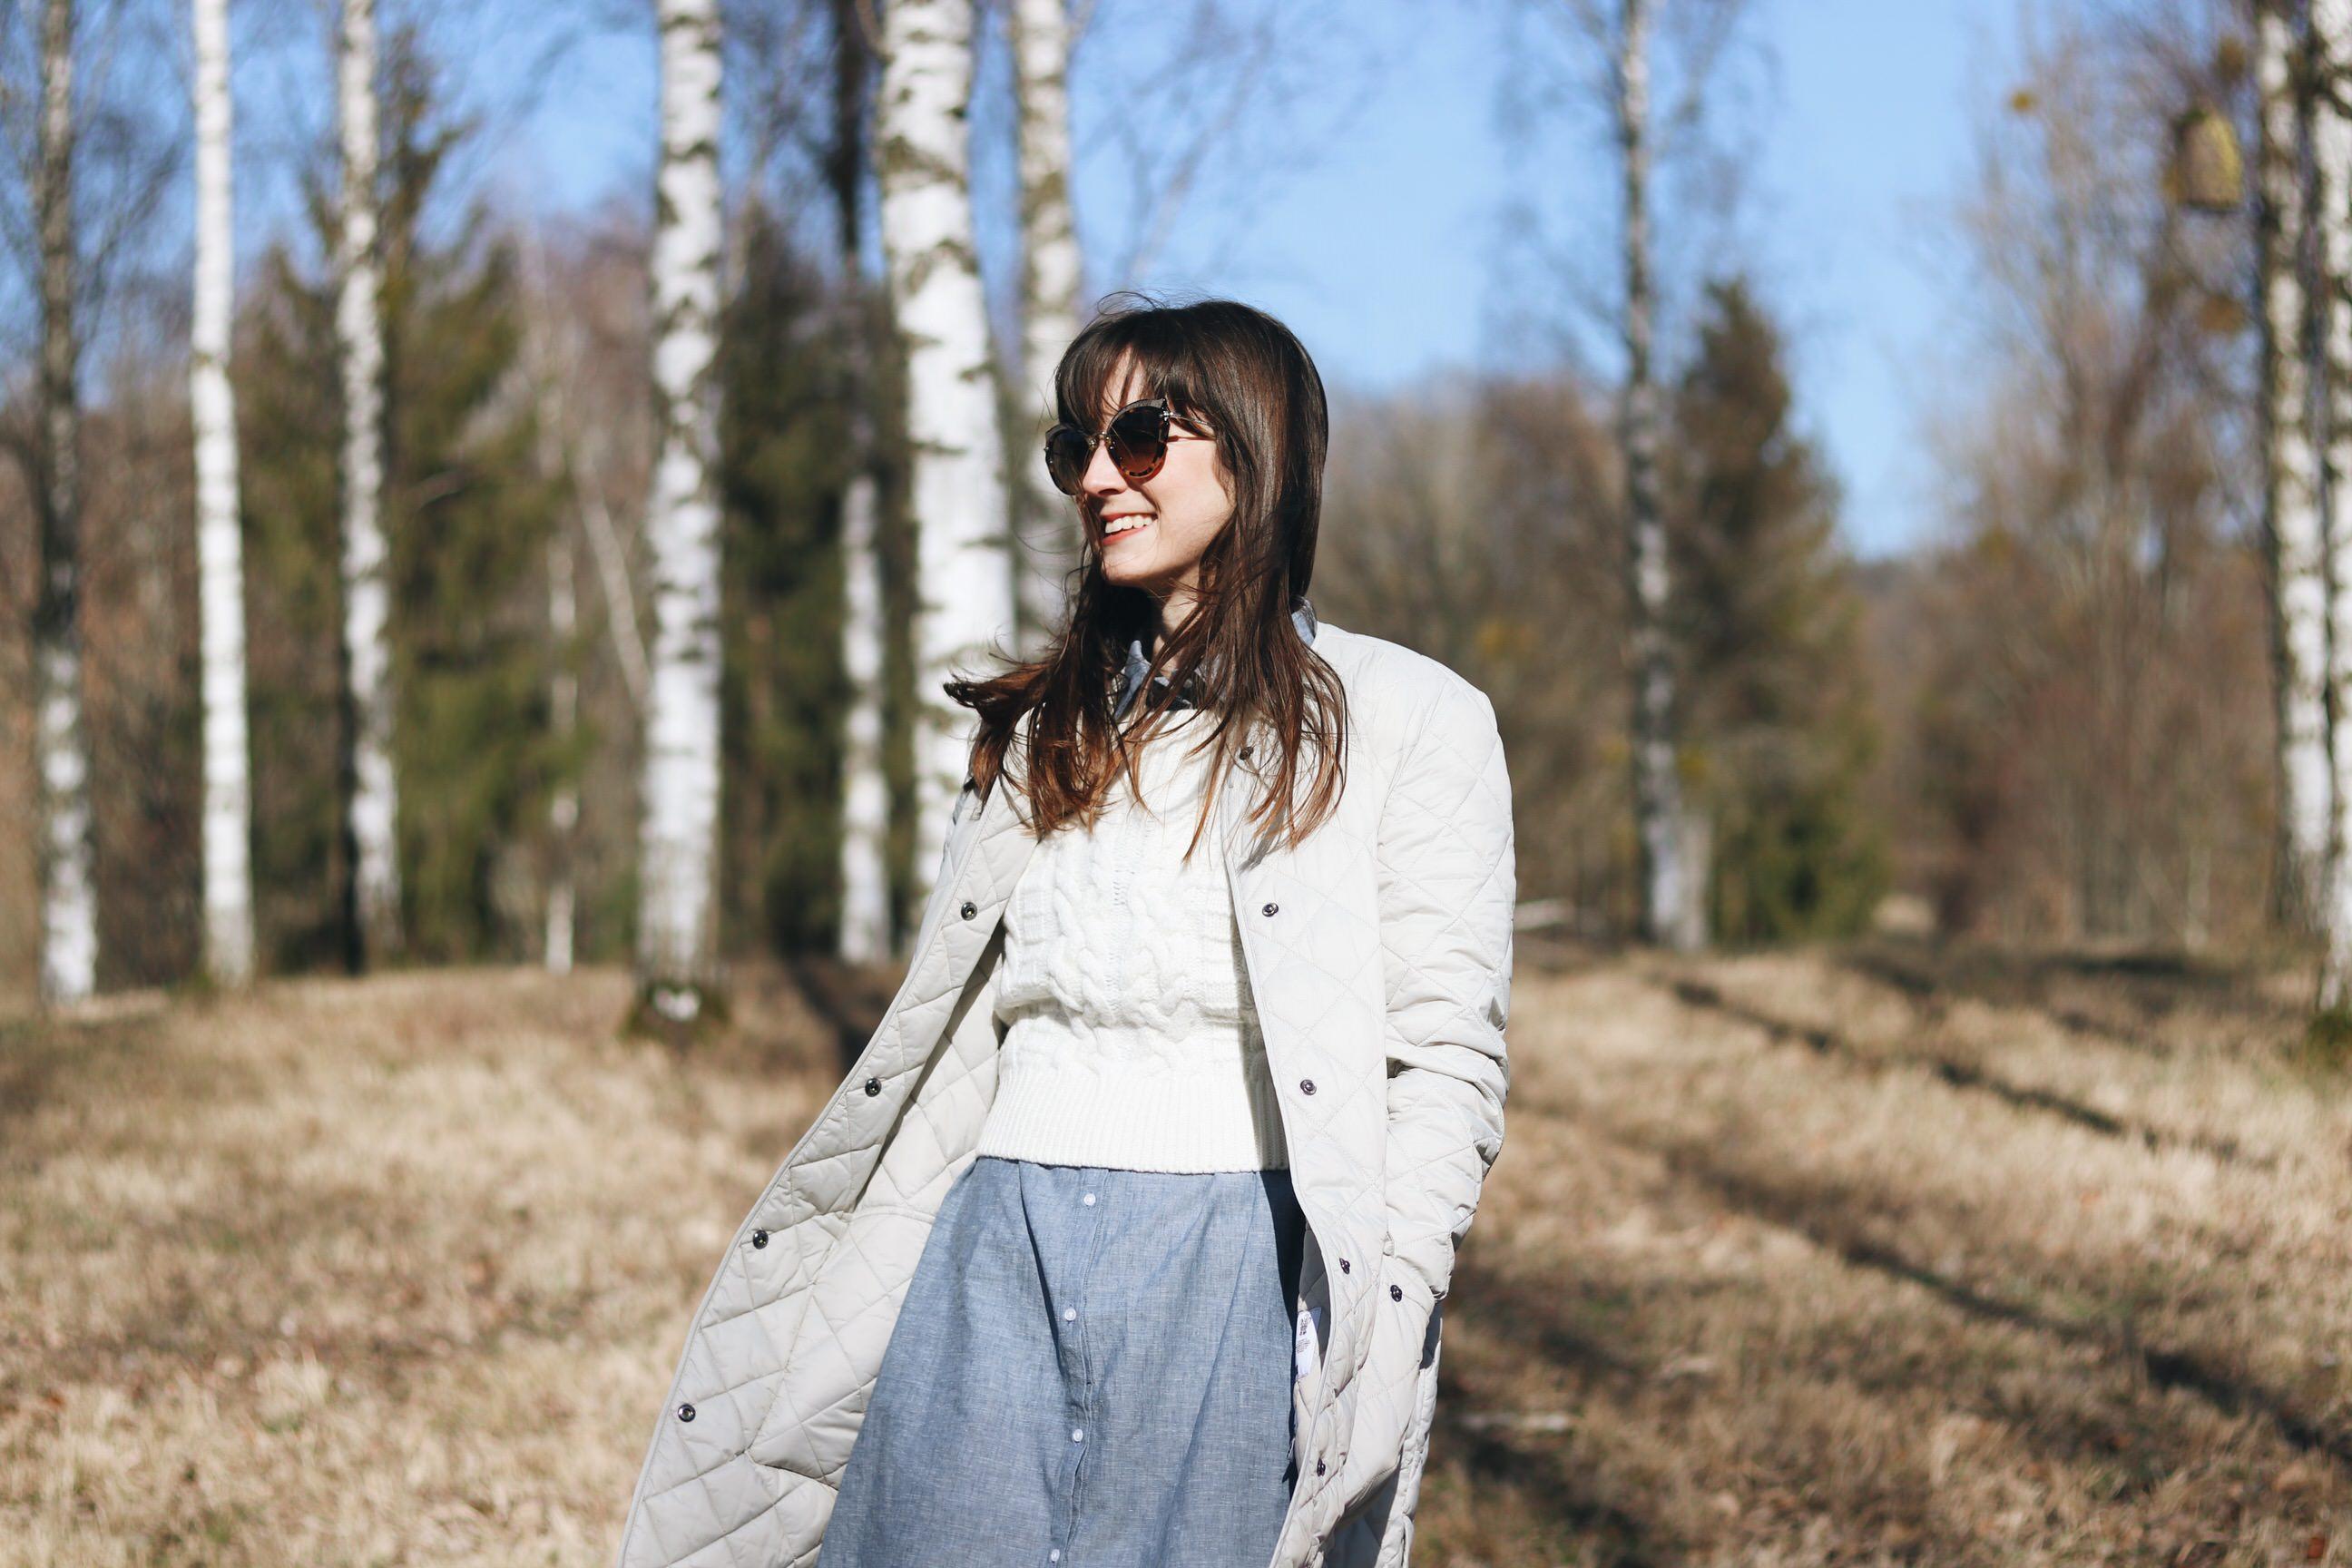 Barbour Outfit Fruehling Trends Modetrends Mantel Longbluse blau Neele Modeblog Top 10 Deutschland Schwarzwald